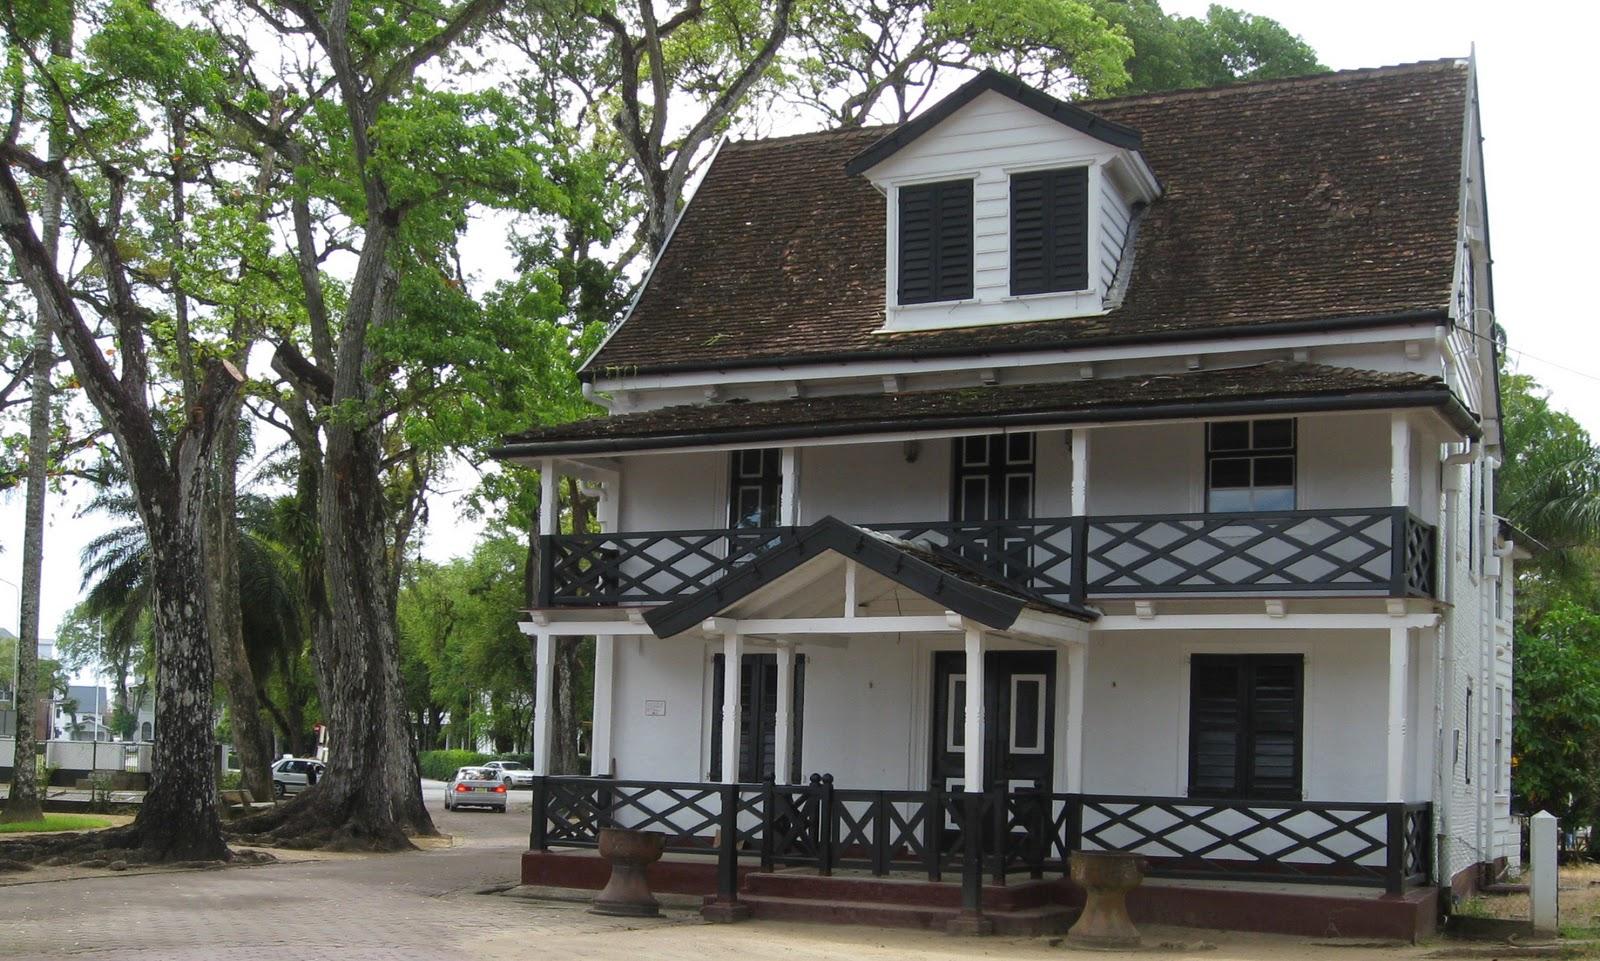 Novel Adventurers Colonial Dutch Architecture of Paramaribo